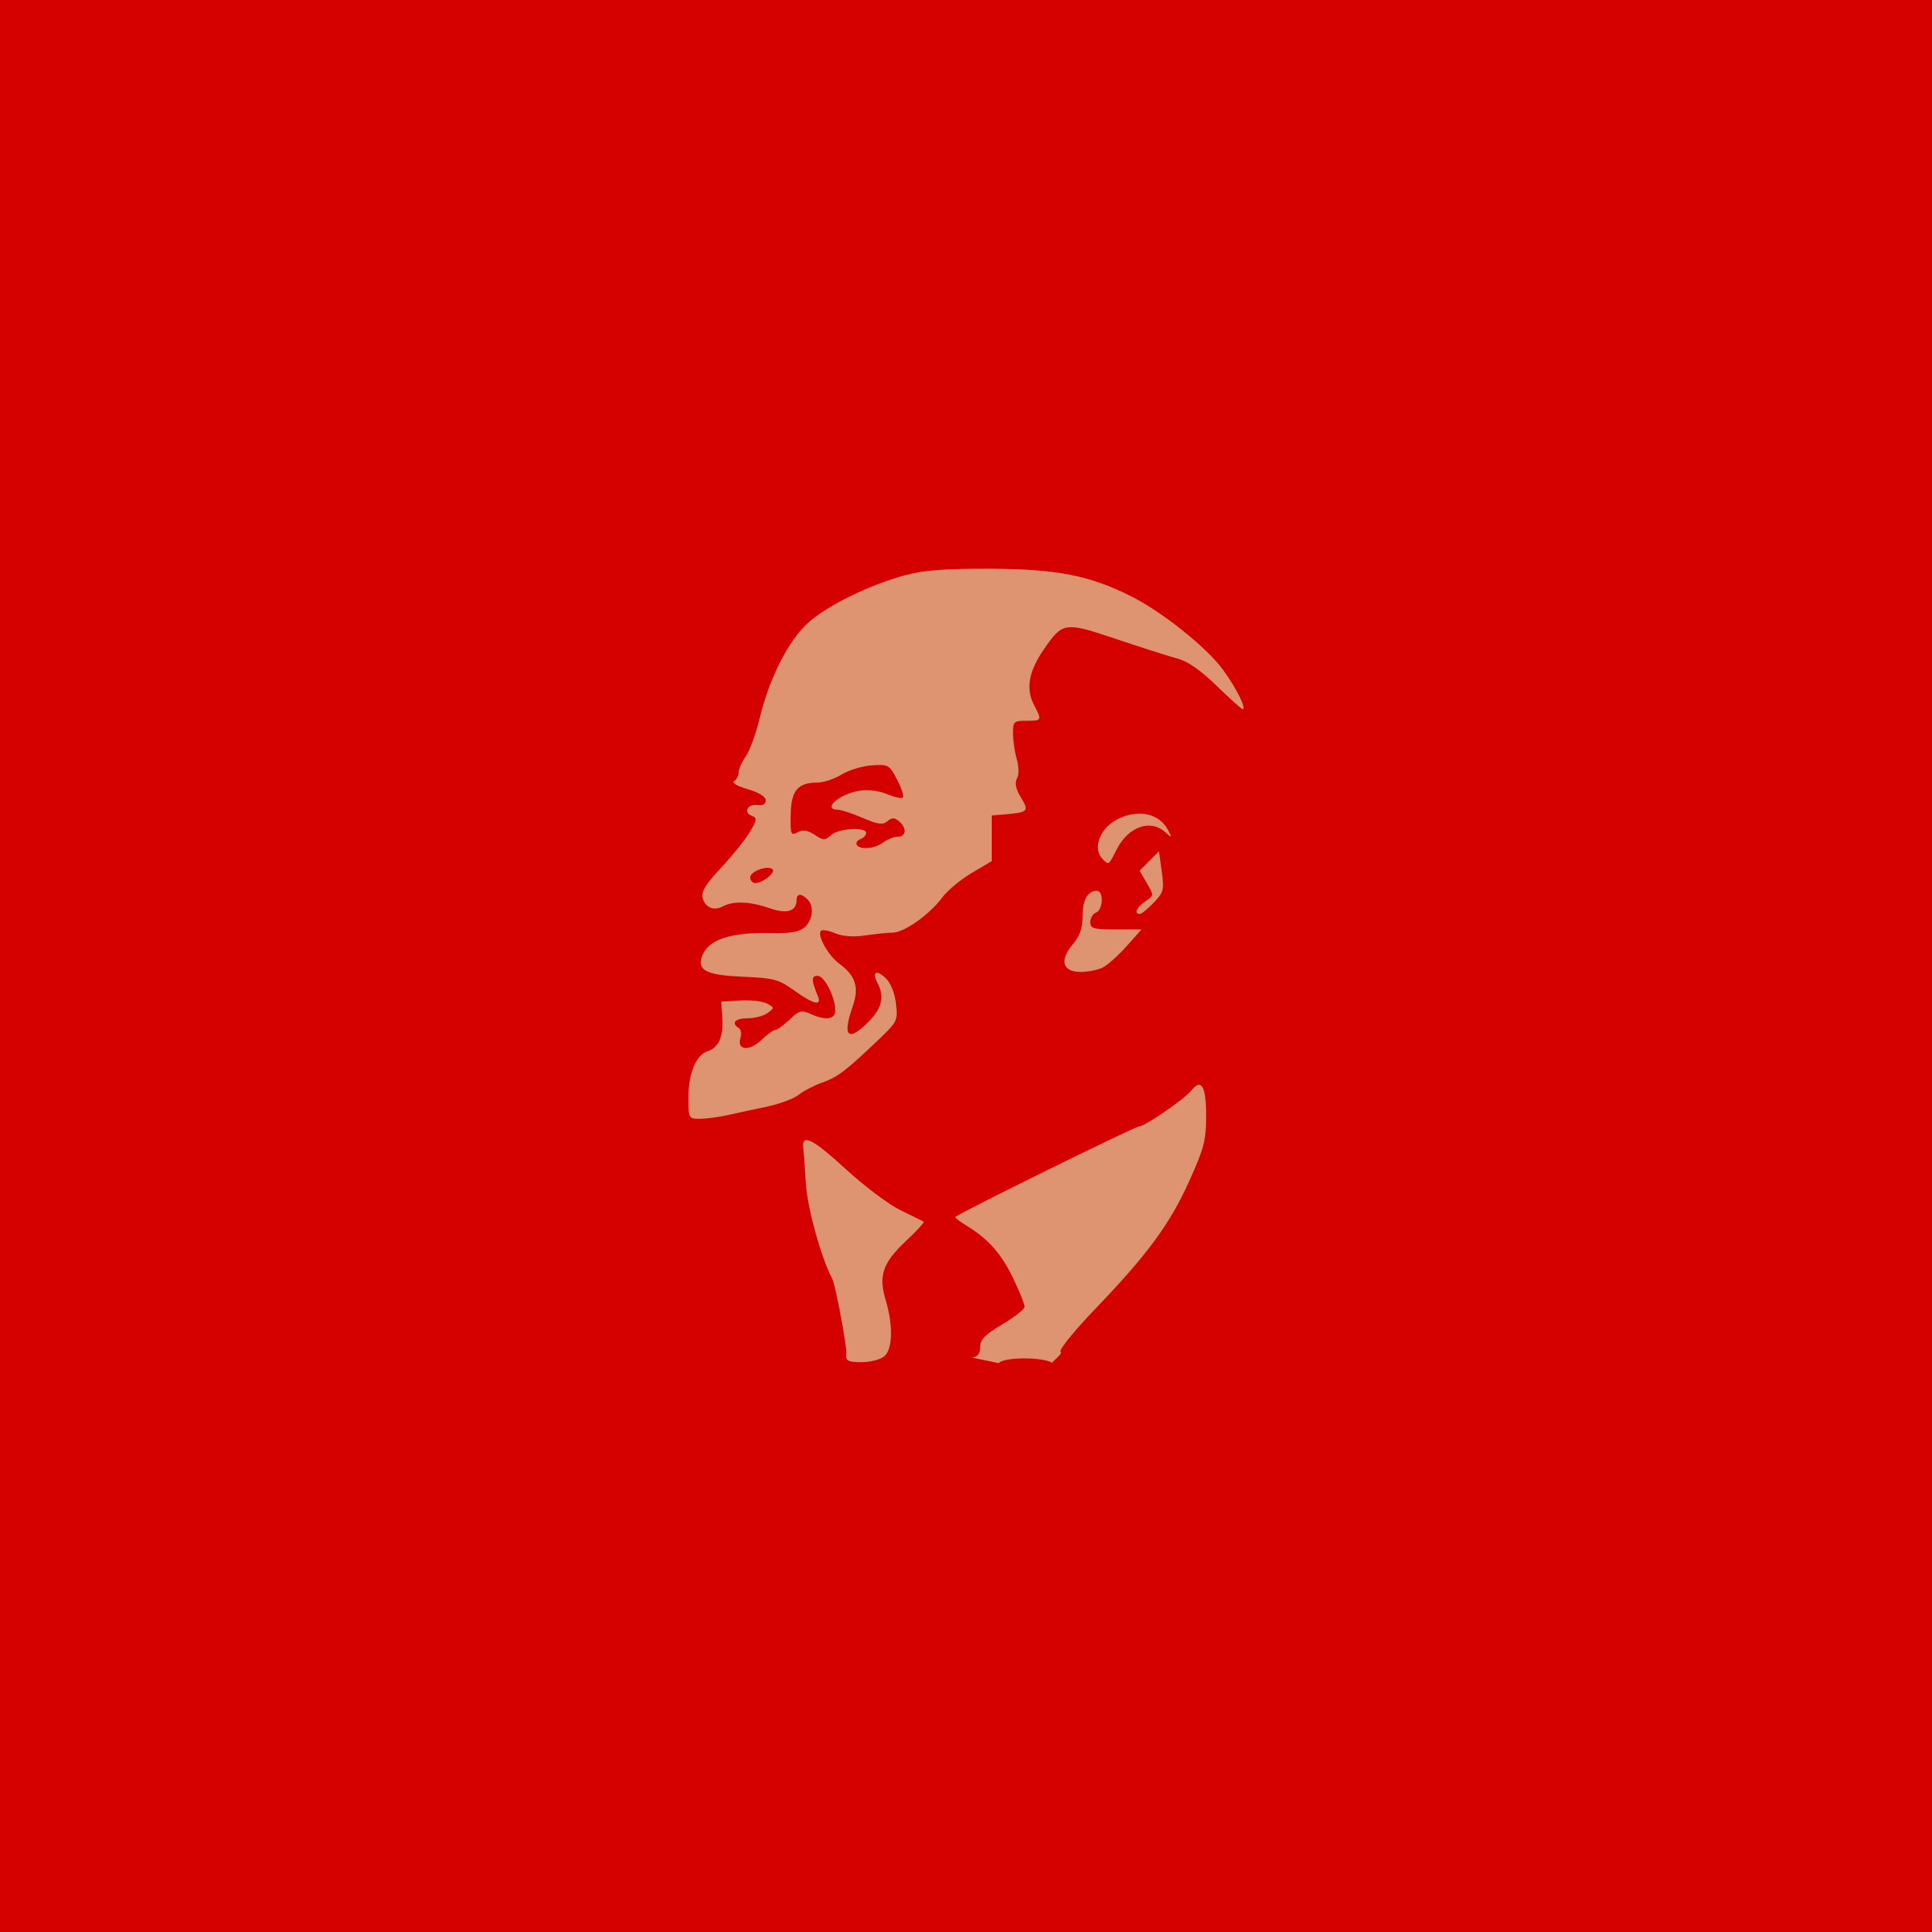 a biography of vladimir lenin a russian communist revolutionary politician and political theorist